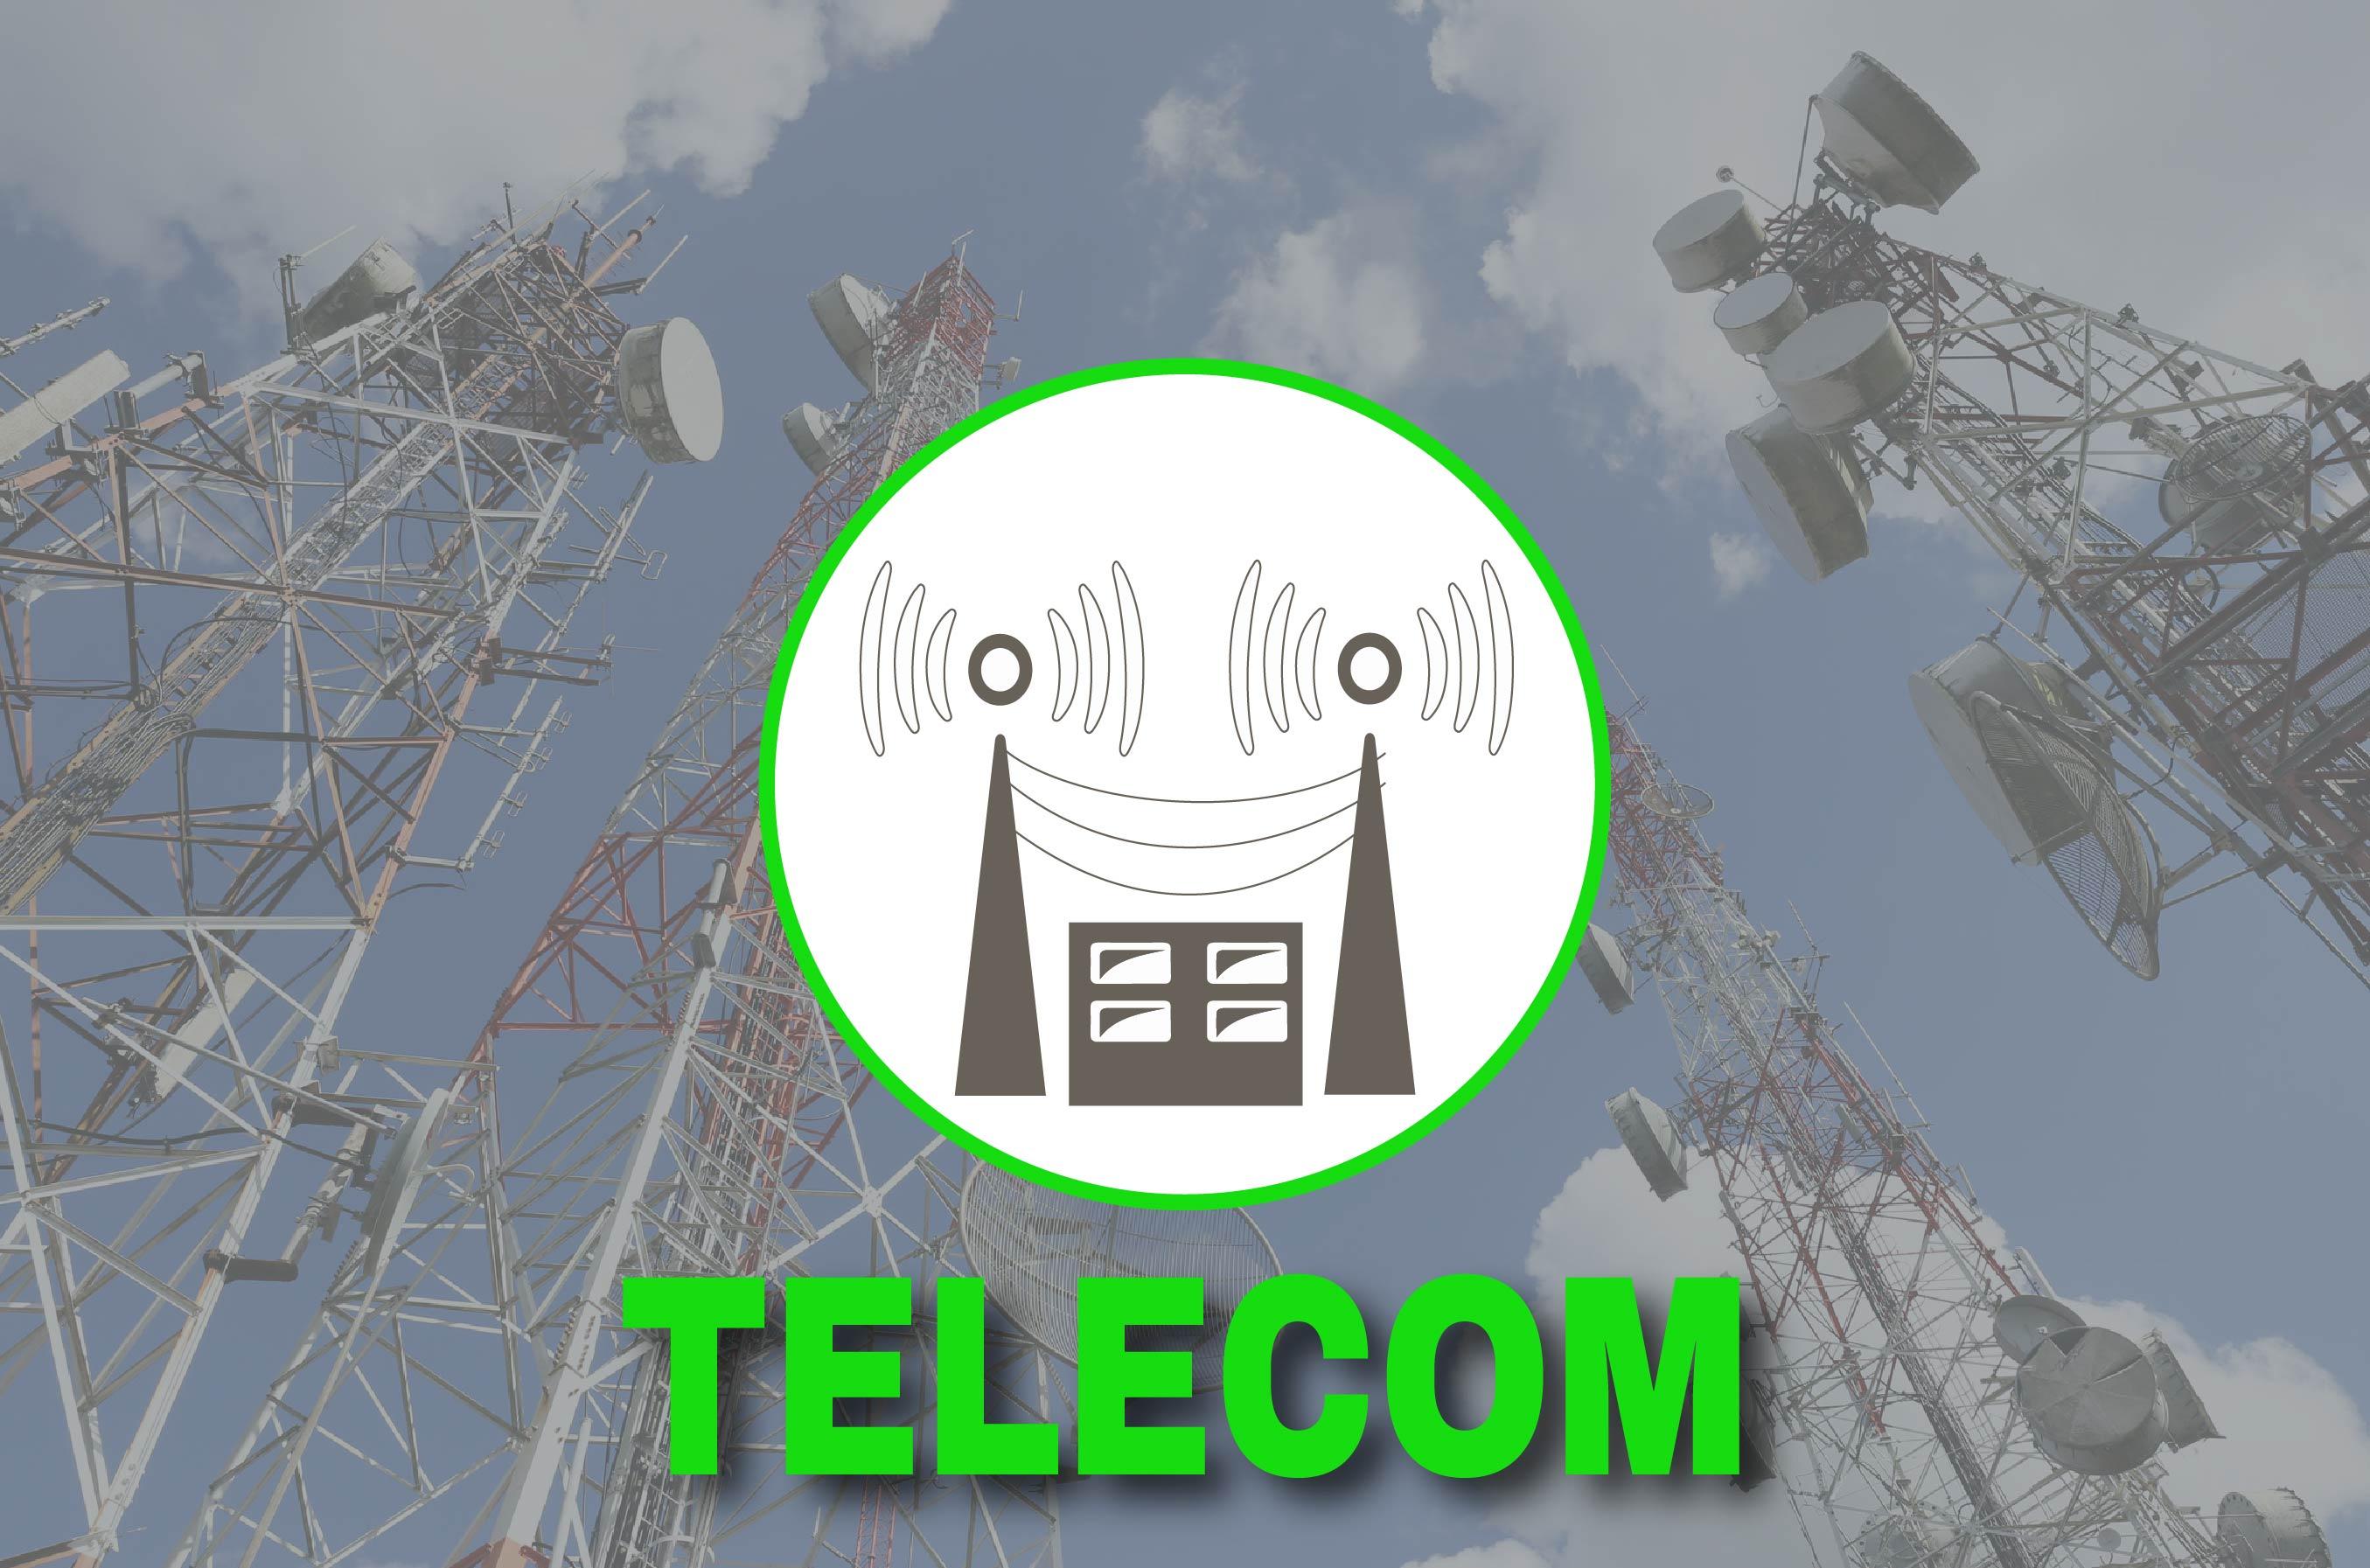 telecom industry experience